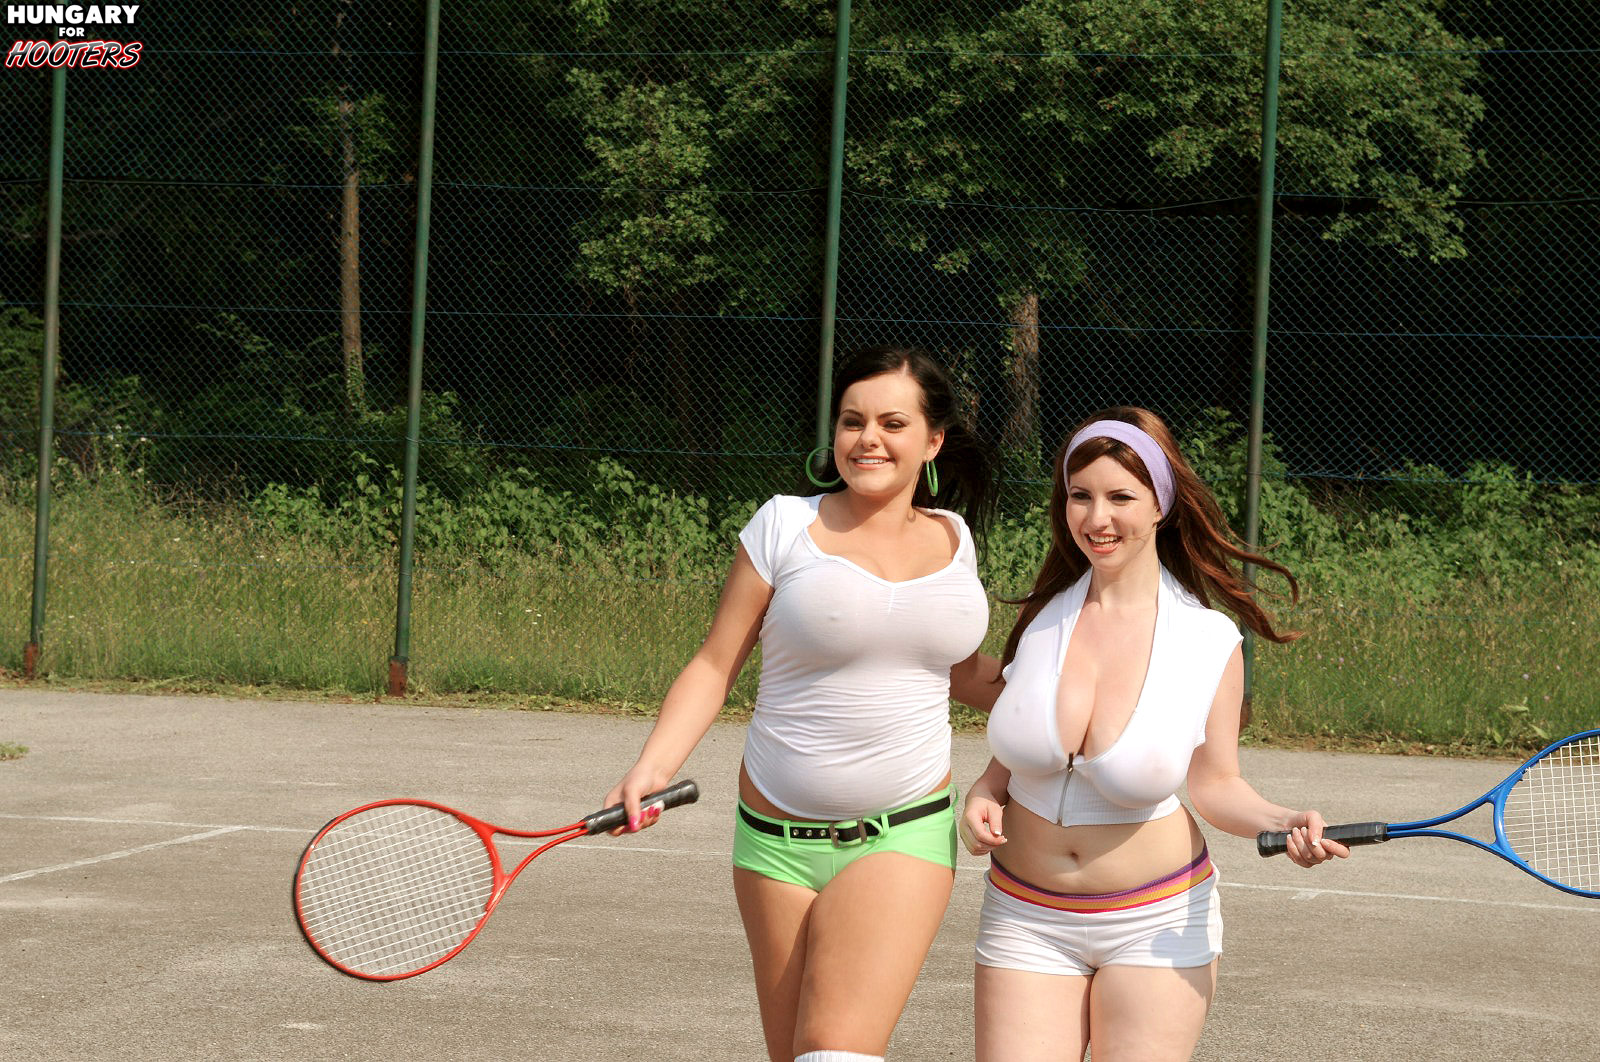 tennis Karina hart busty